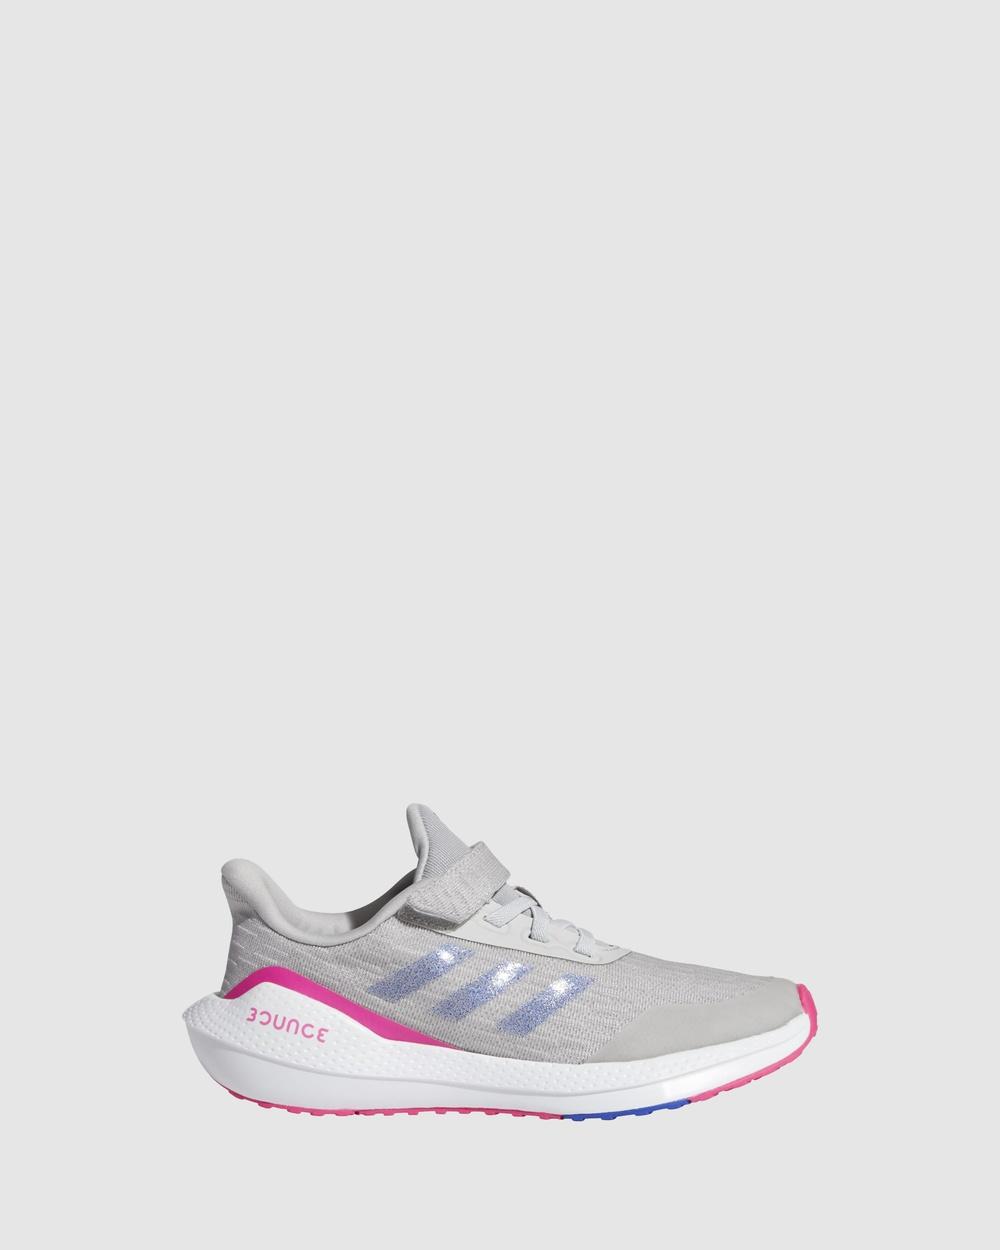 adidas Performance EQ21 Run K Pre School Lifestyle Shoes Grey/Shock Pink Pre-School